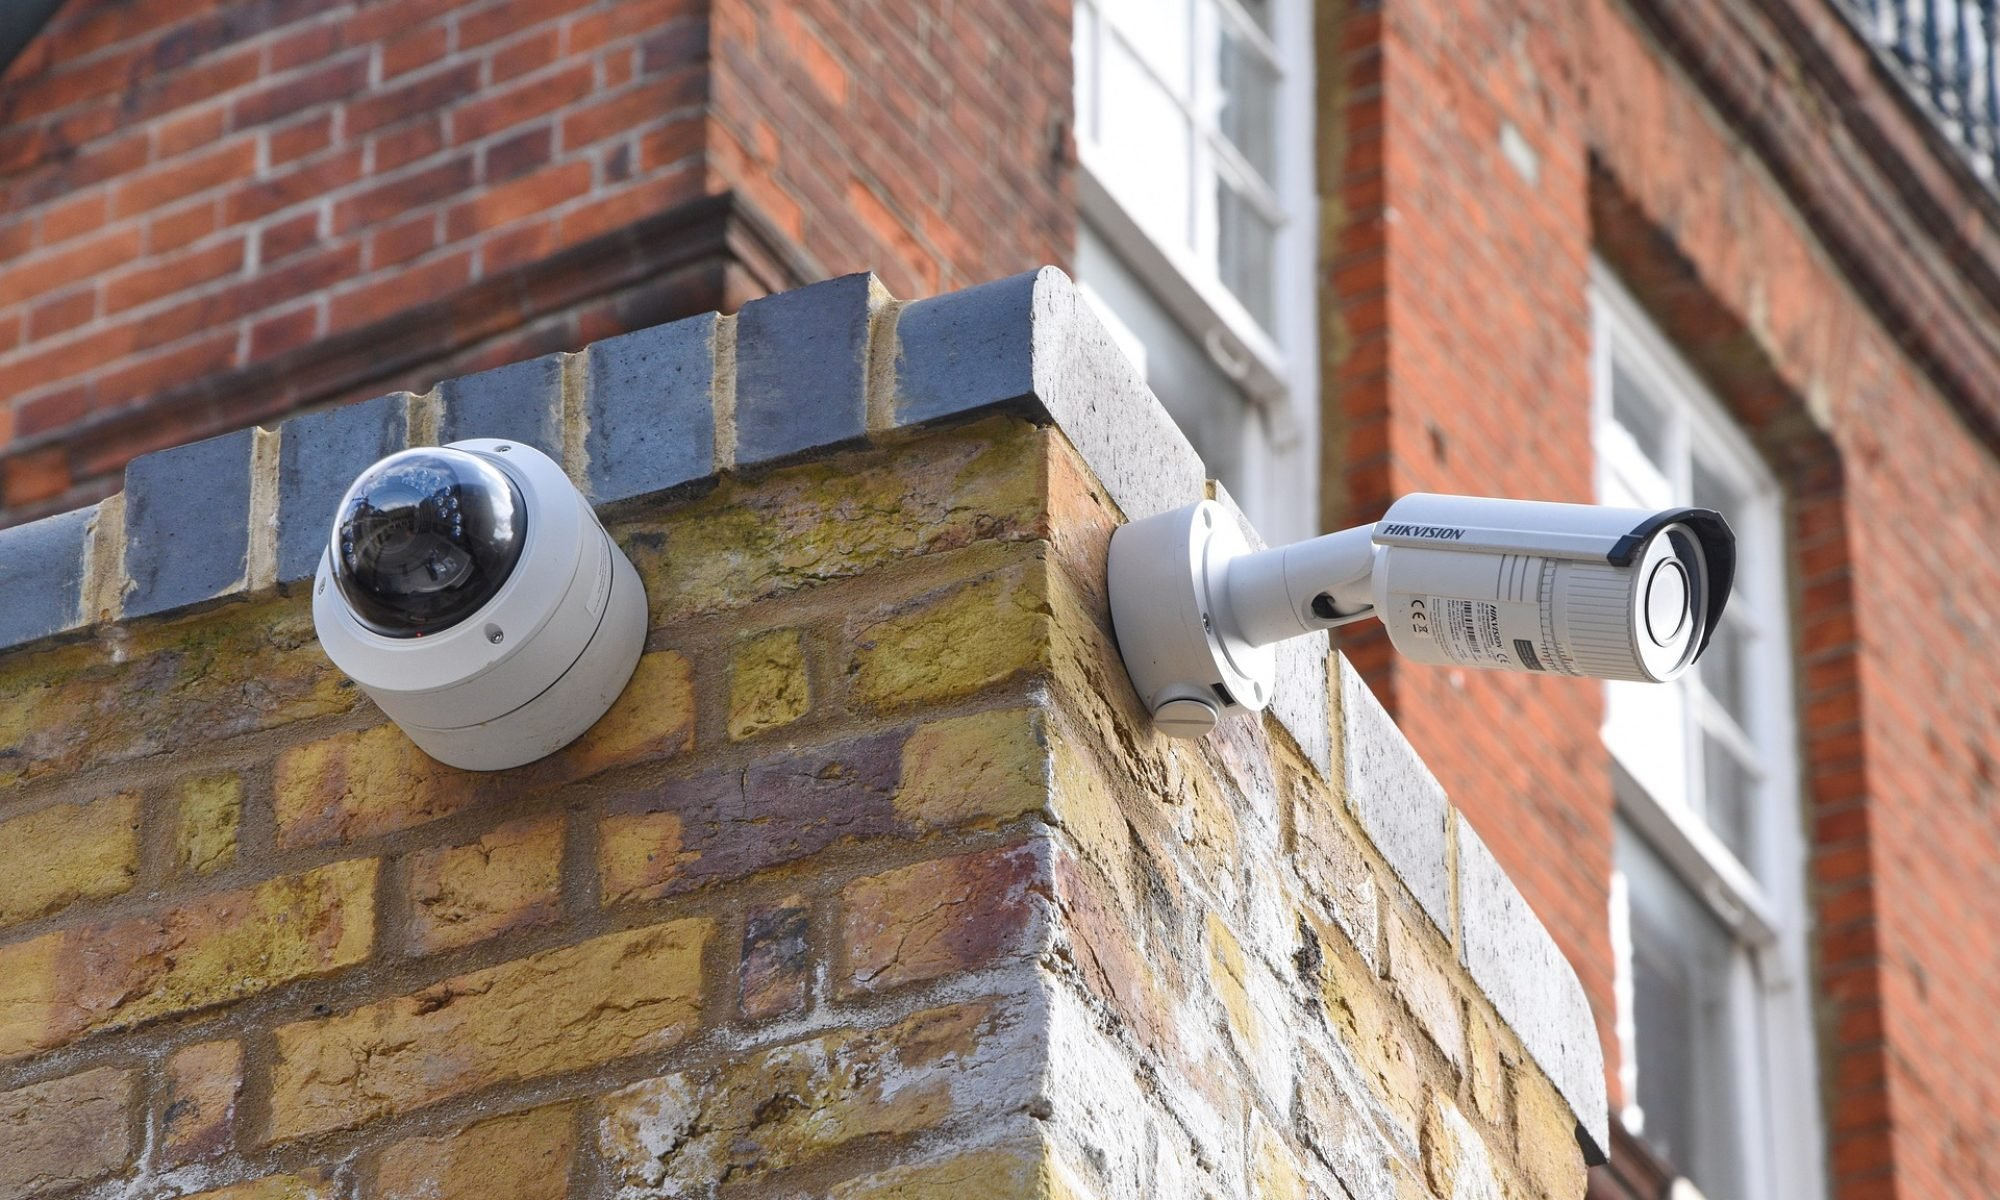 Newcastle Alarm Systems